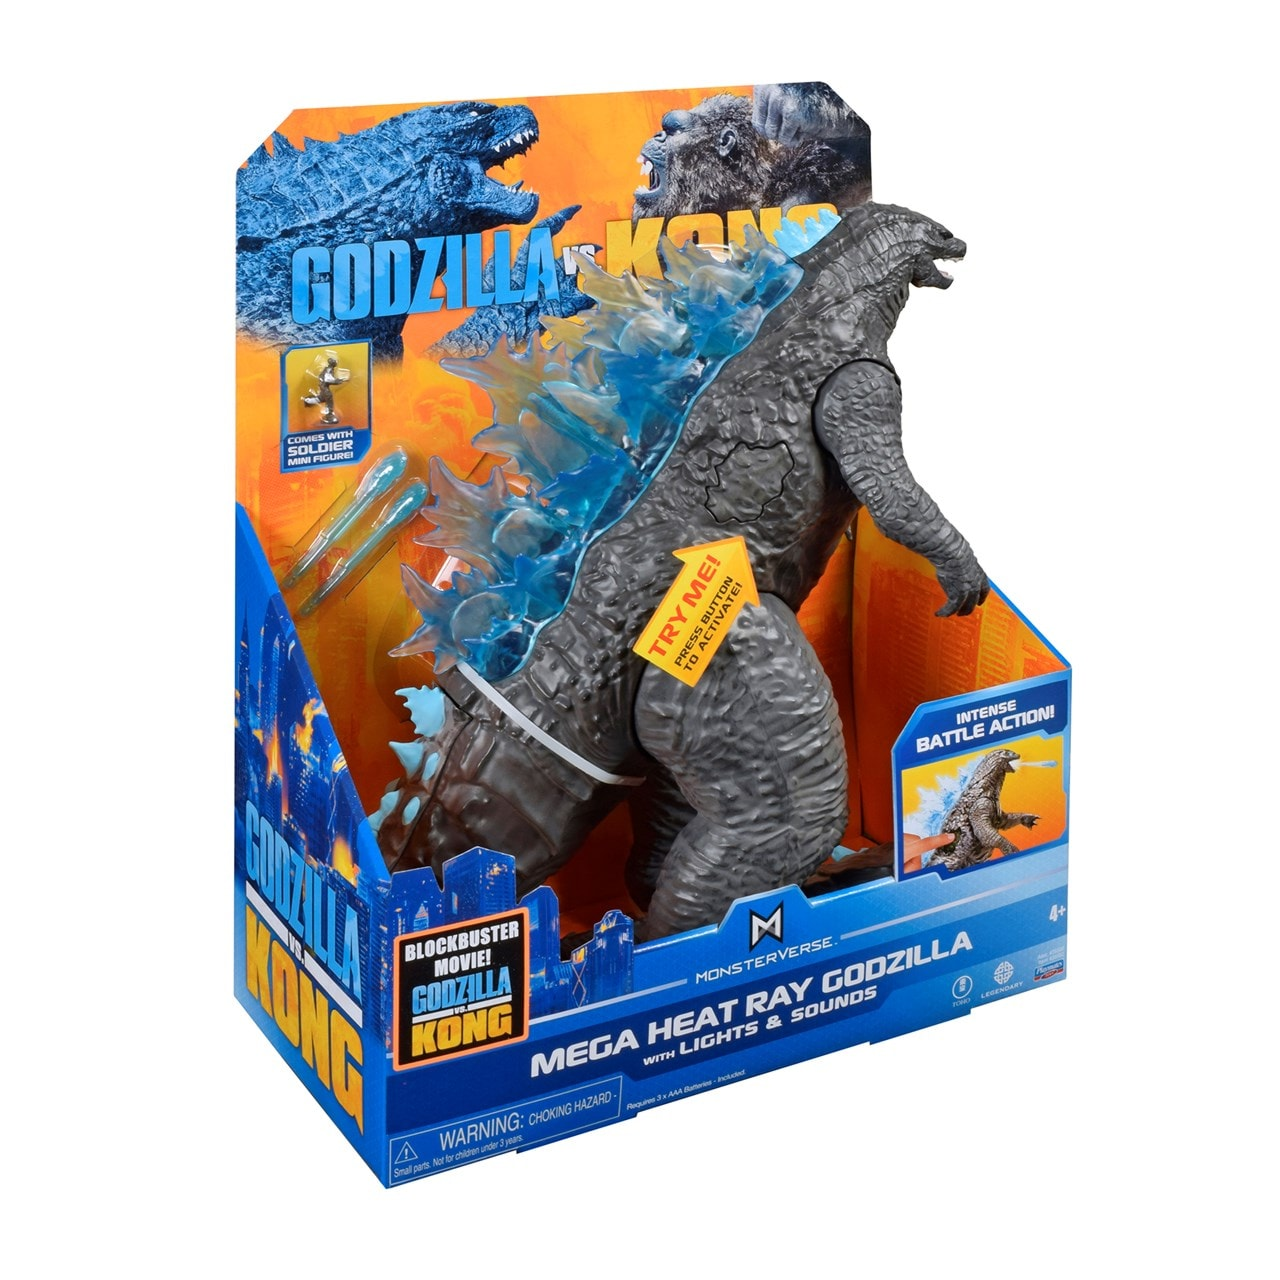 Monsterverse Godzilla vs Kong: Mega Godzilla with Lights & Sounds Action Figure - 6